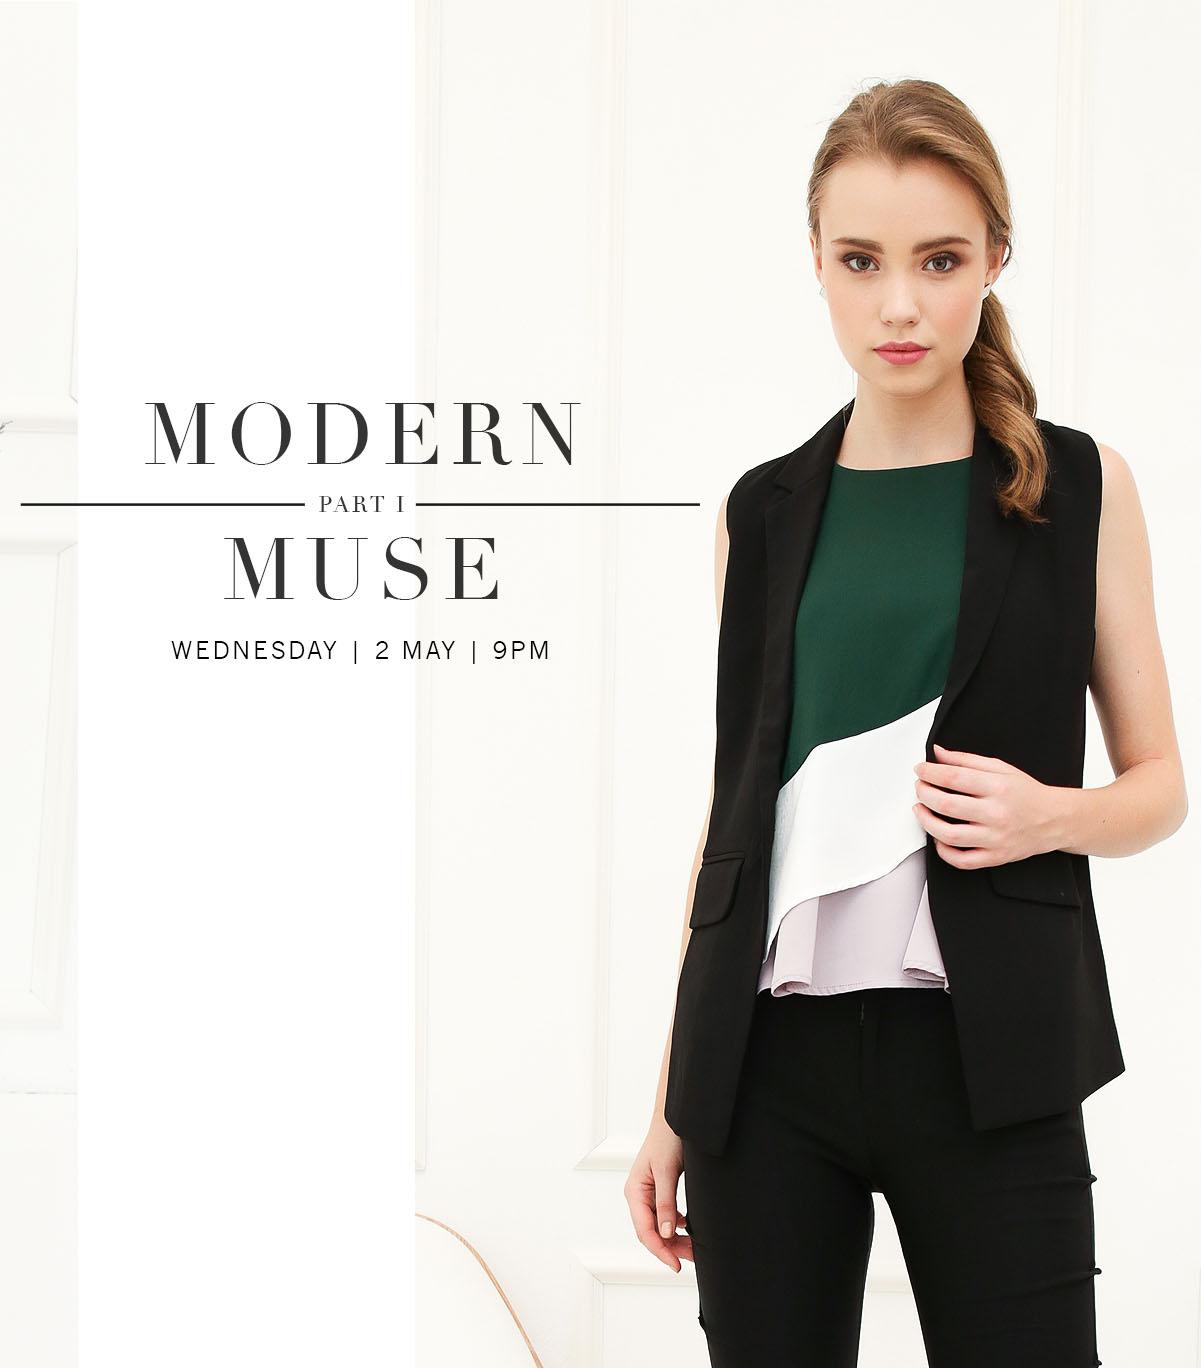 MODERN MUSE PART I